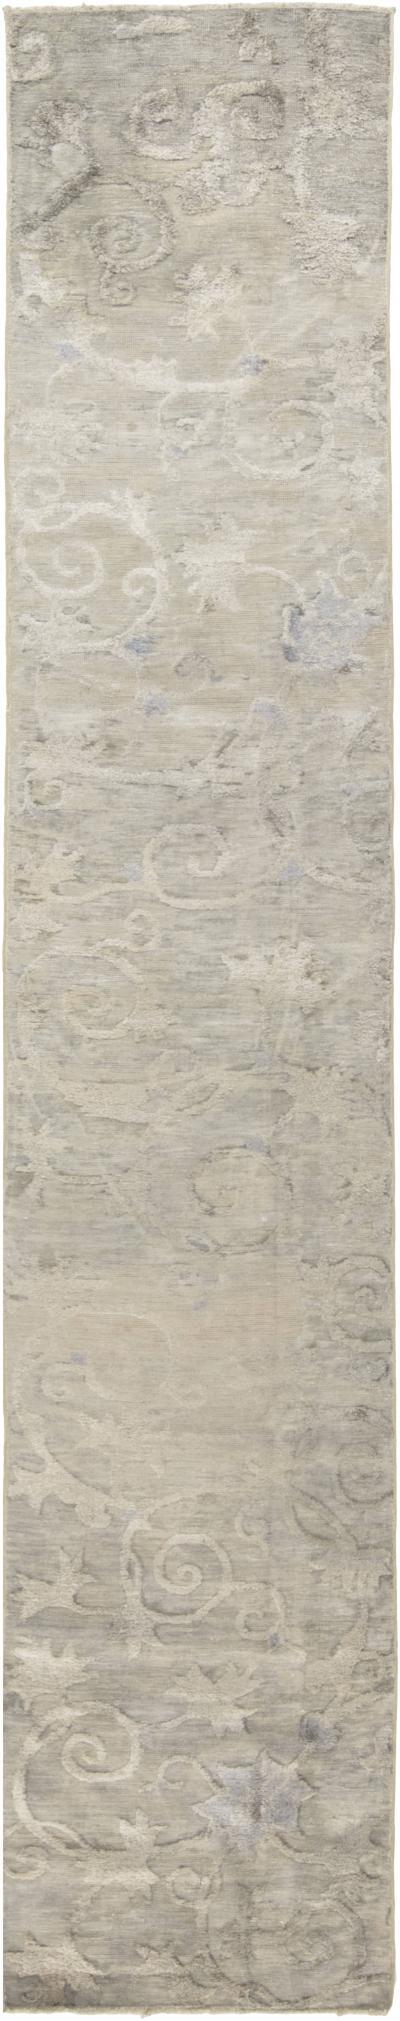 Antique Silk Chinese Runner fragment